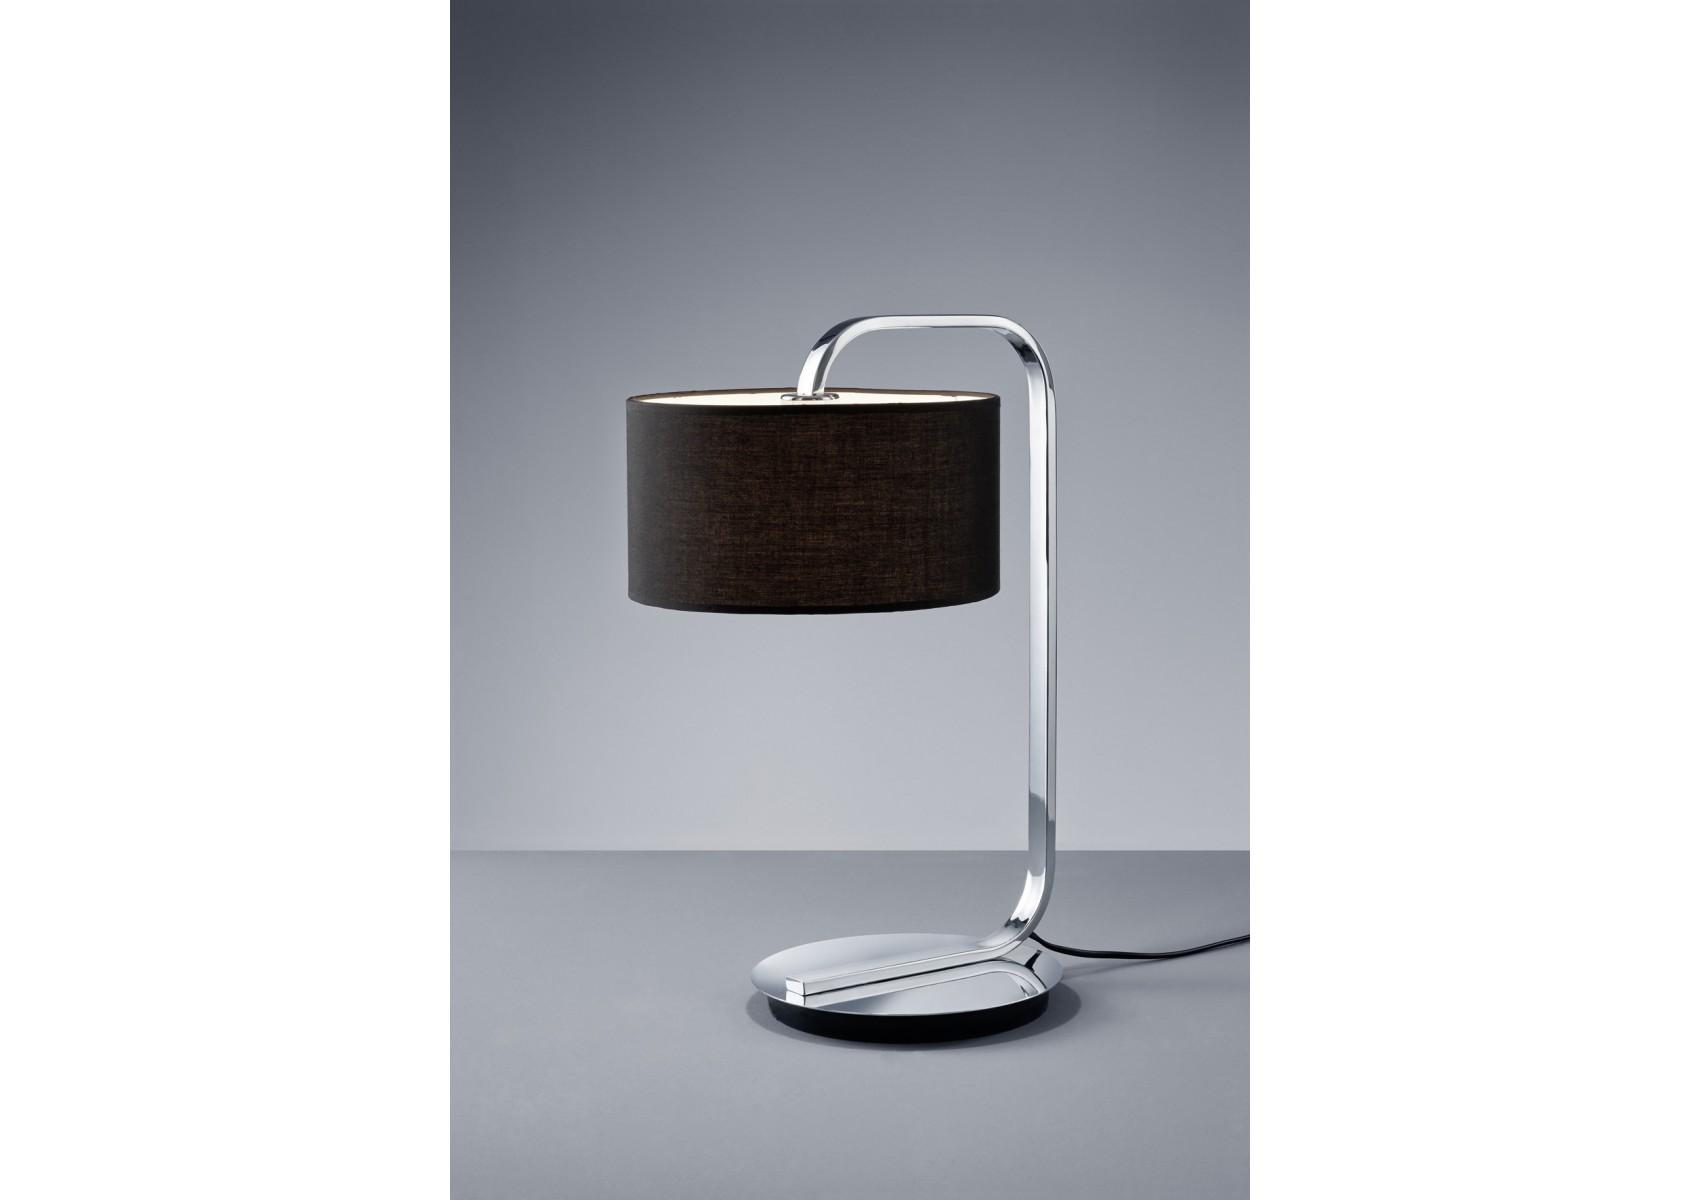 Lampe poser design cannes abat jour boite design - Lampe a poser design ...